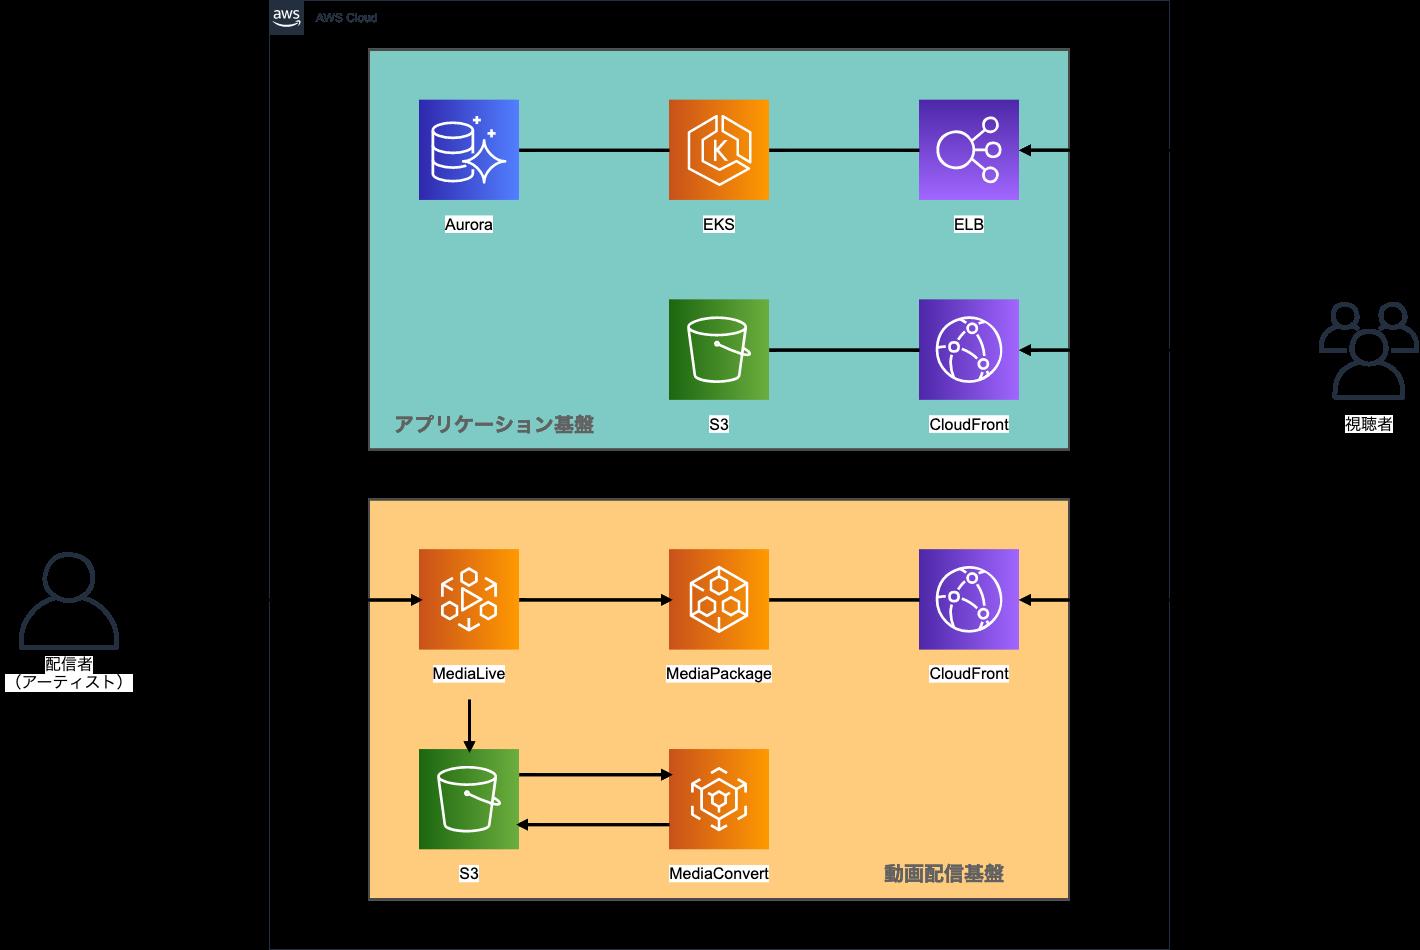 AFLSライブ動画配信基盤の構成概要図